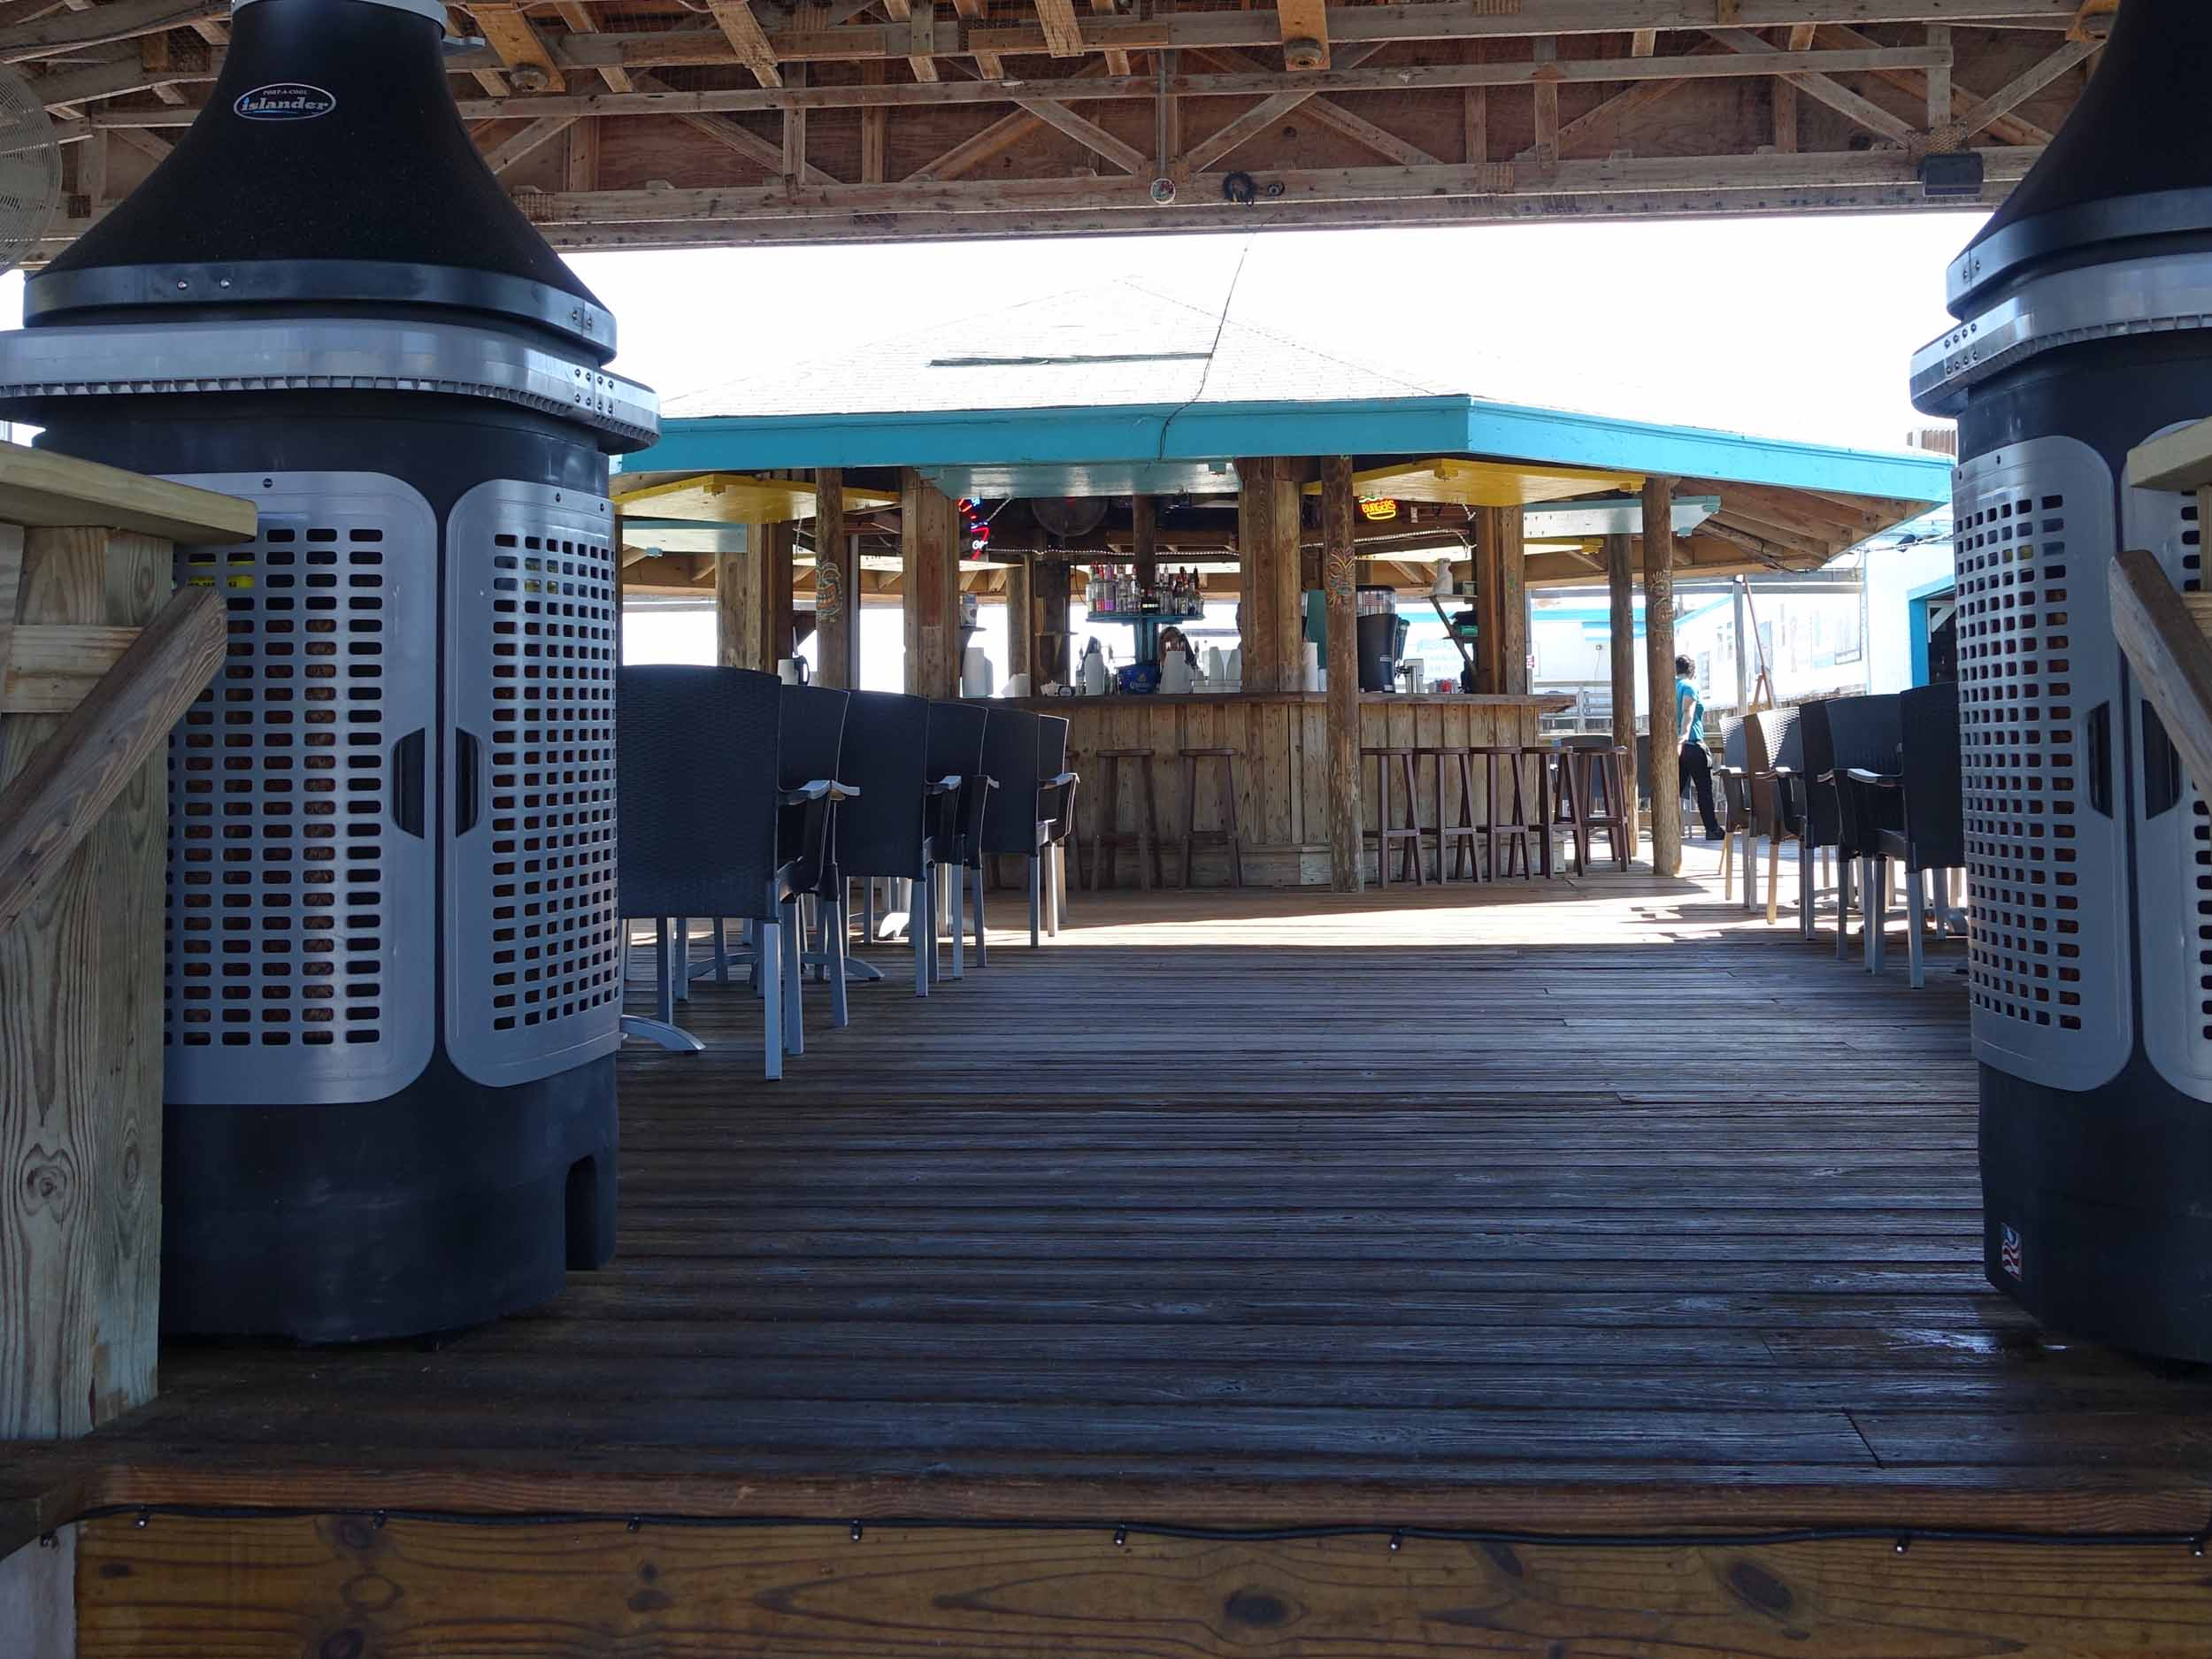 Keith's Oyster Bar Interior